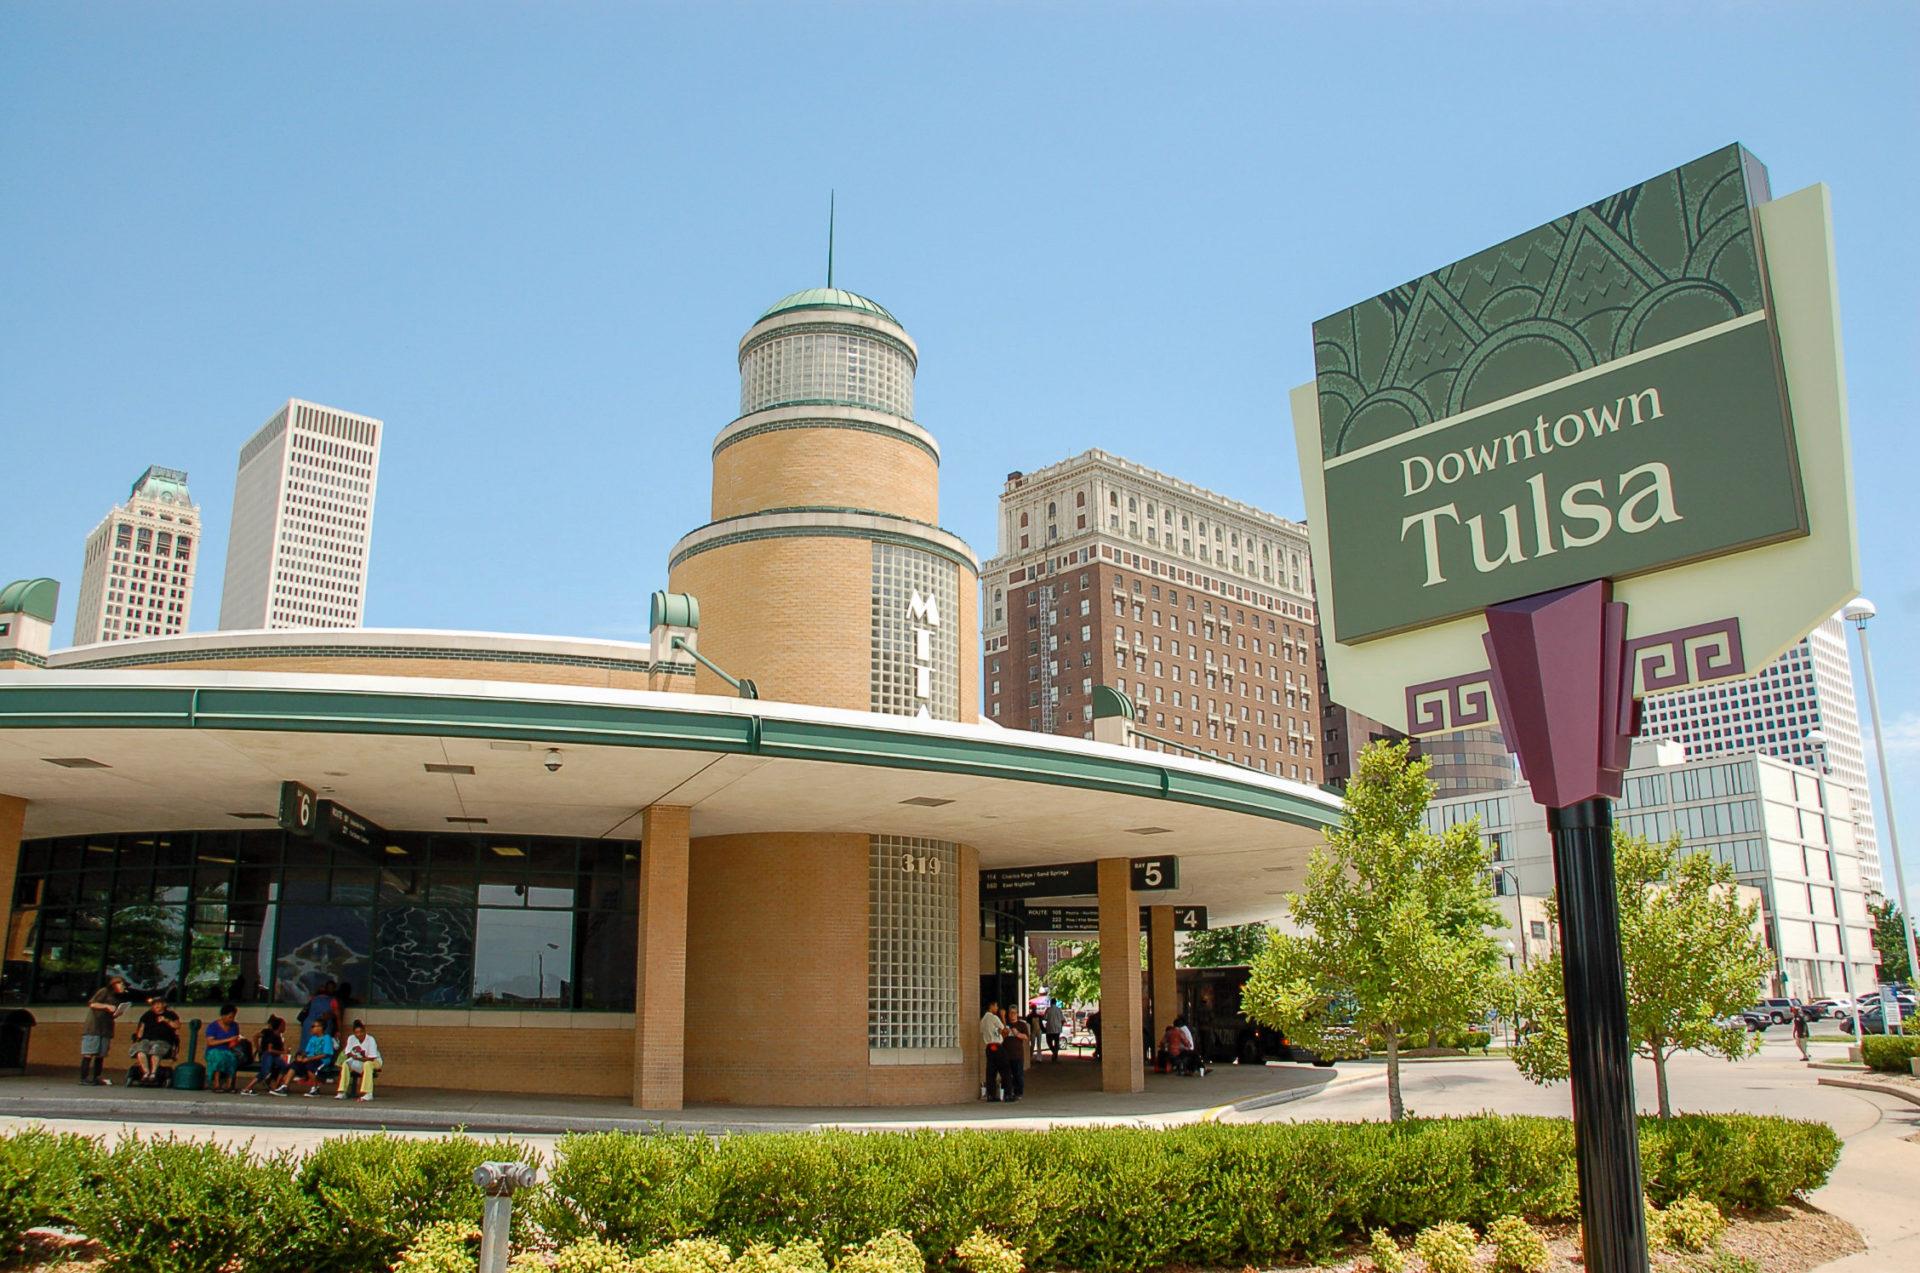 Art-déco-Bauten in Downtown Tulsa